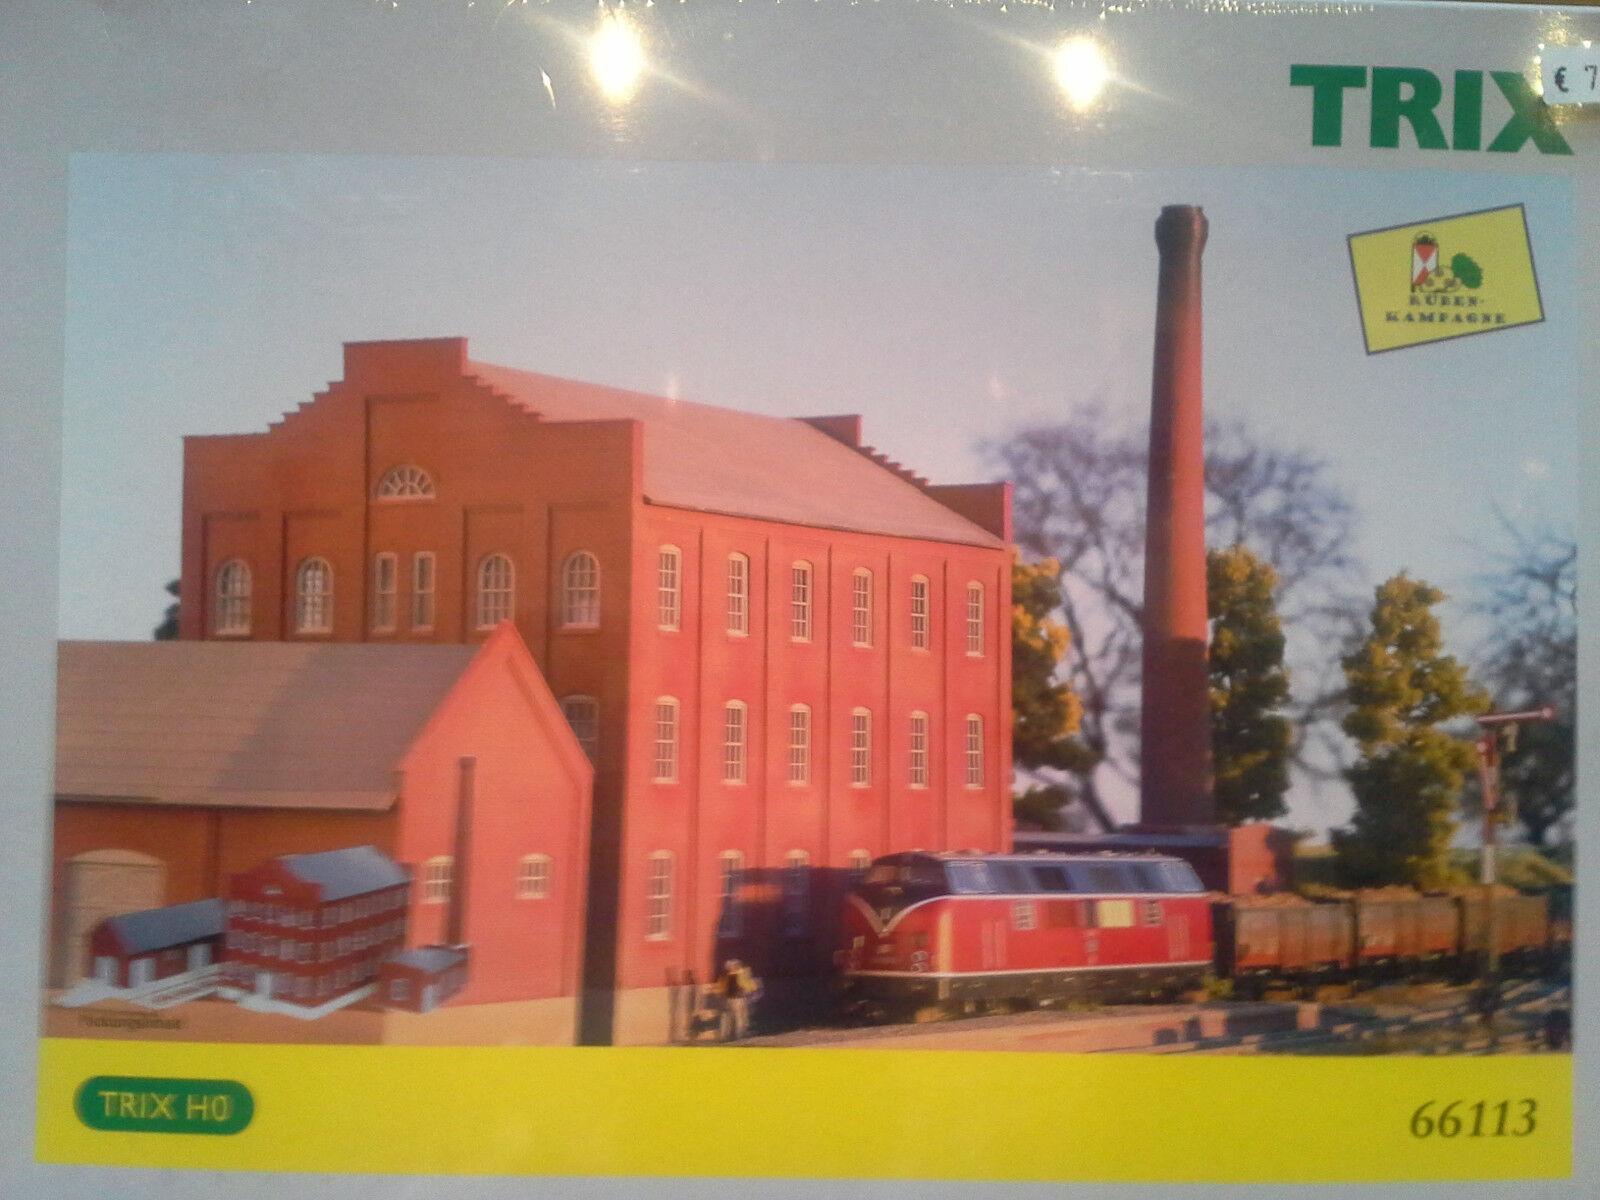 Barbabietole da zucchero fabbrica di Trix